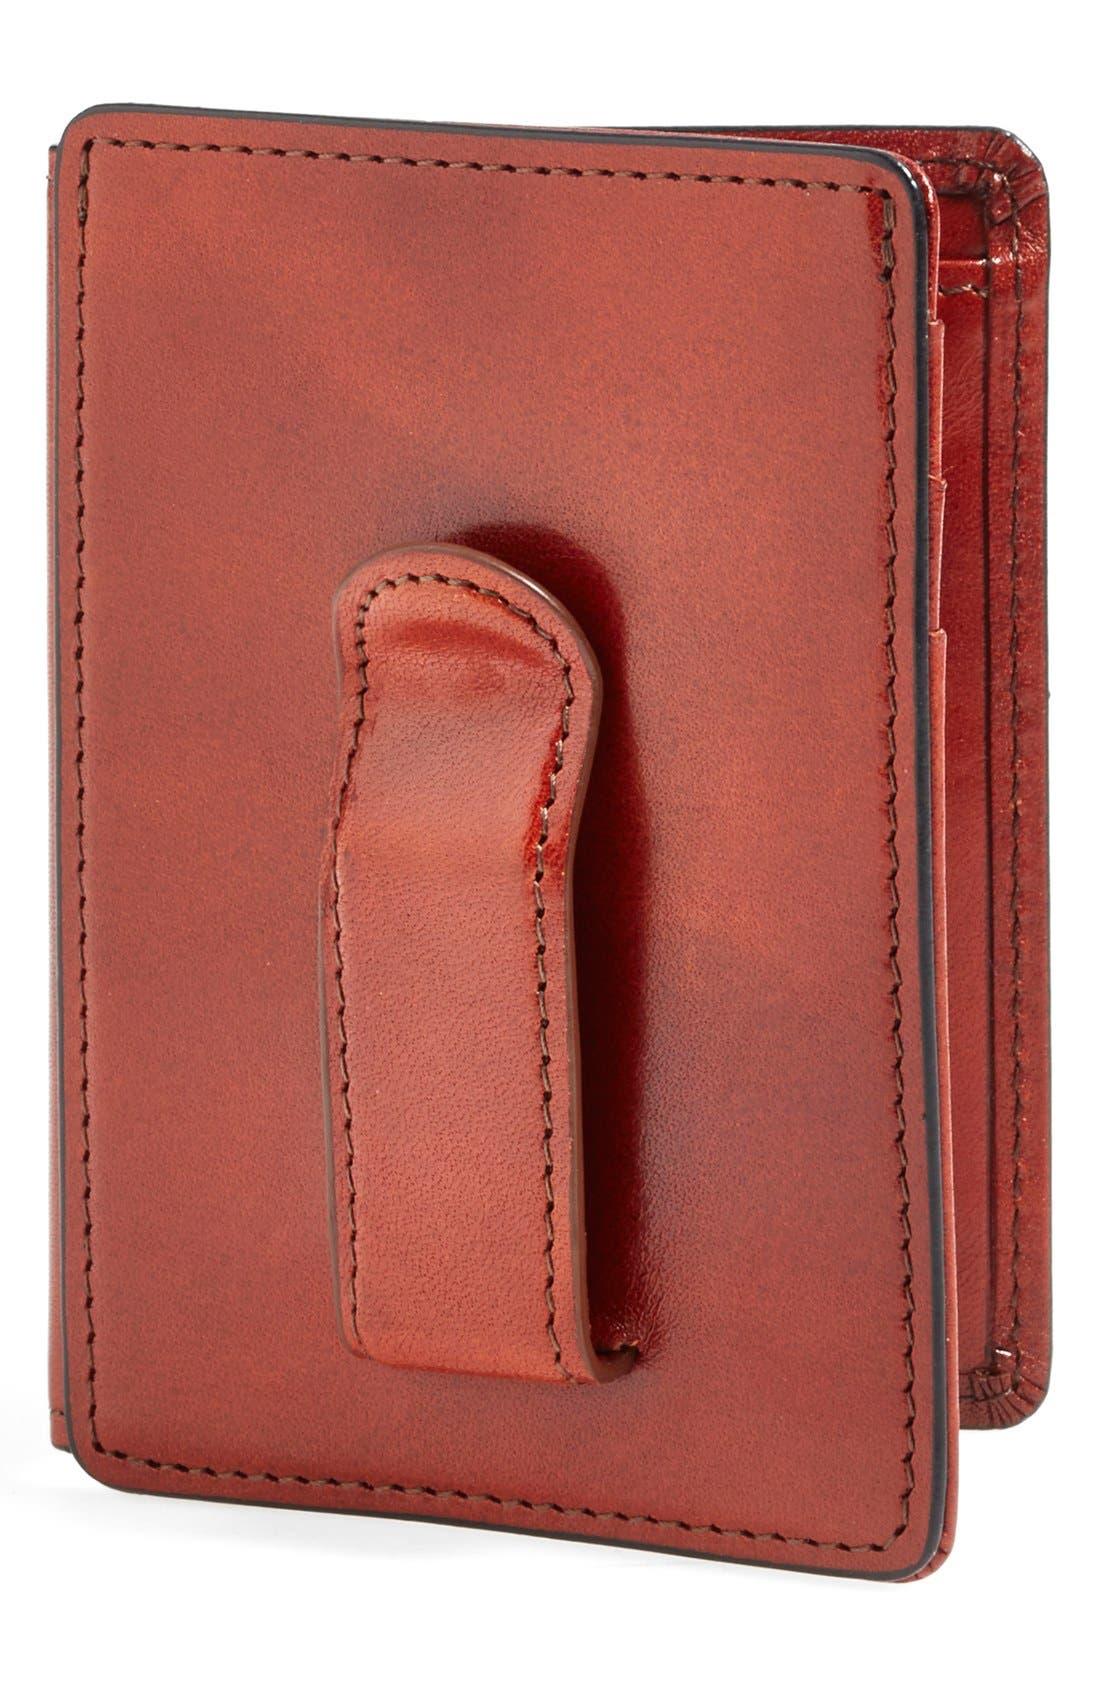 Bosca 'Old Leather' Front Pocket ID Wallet